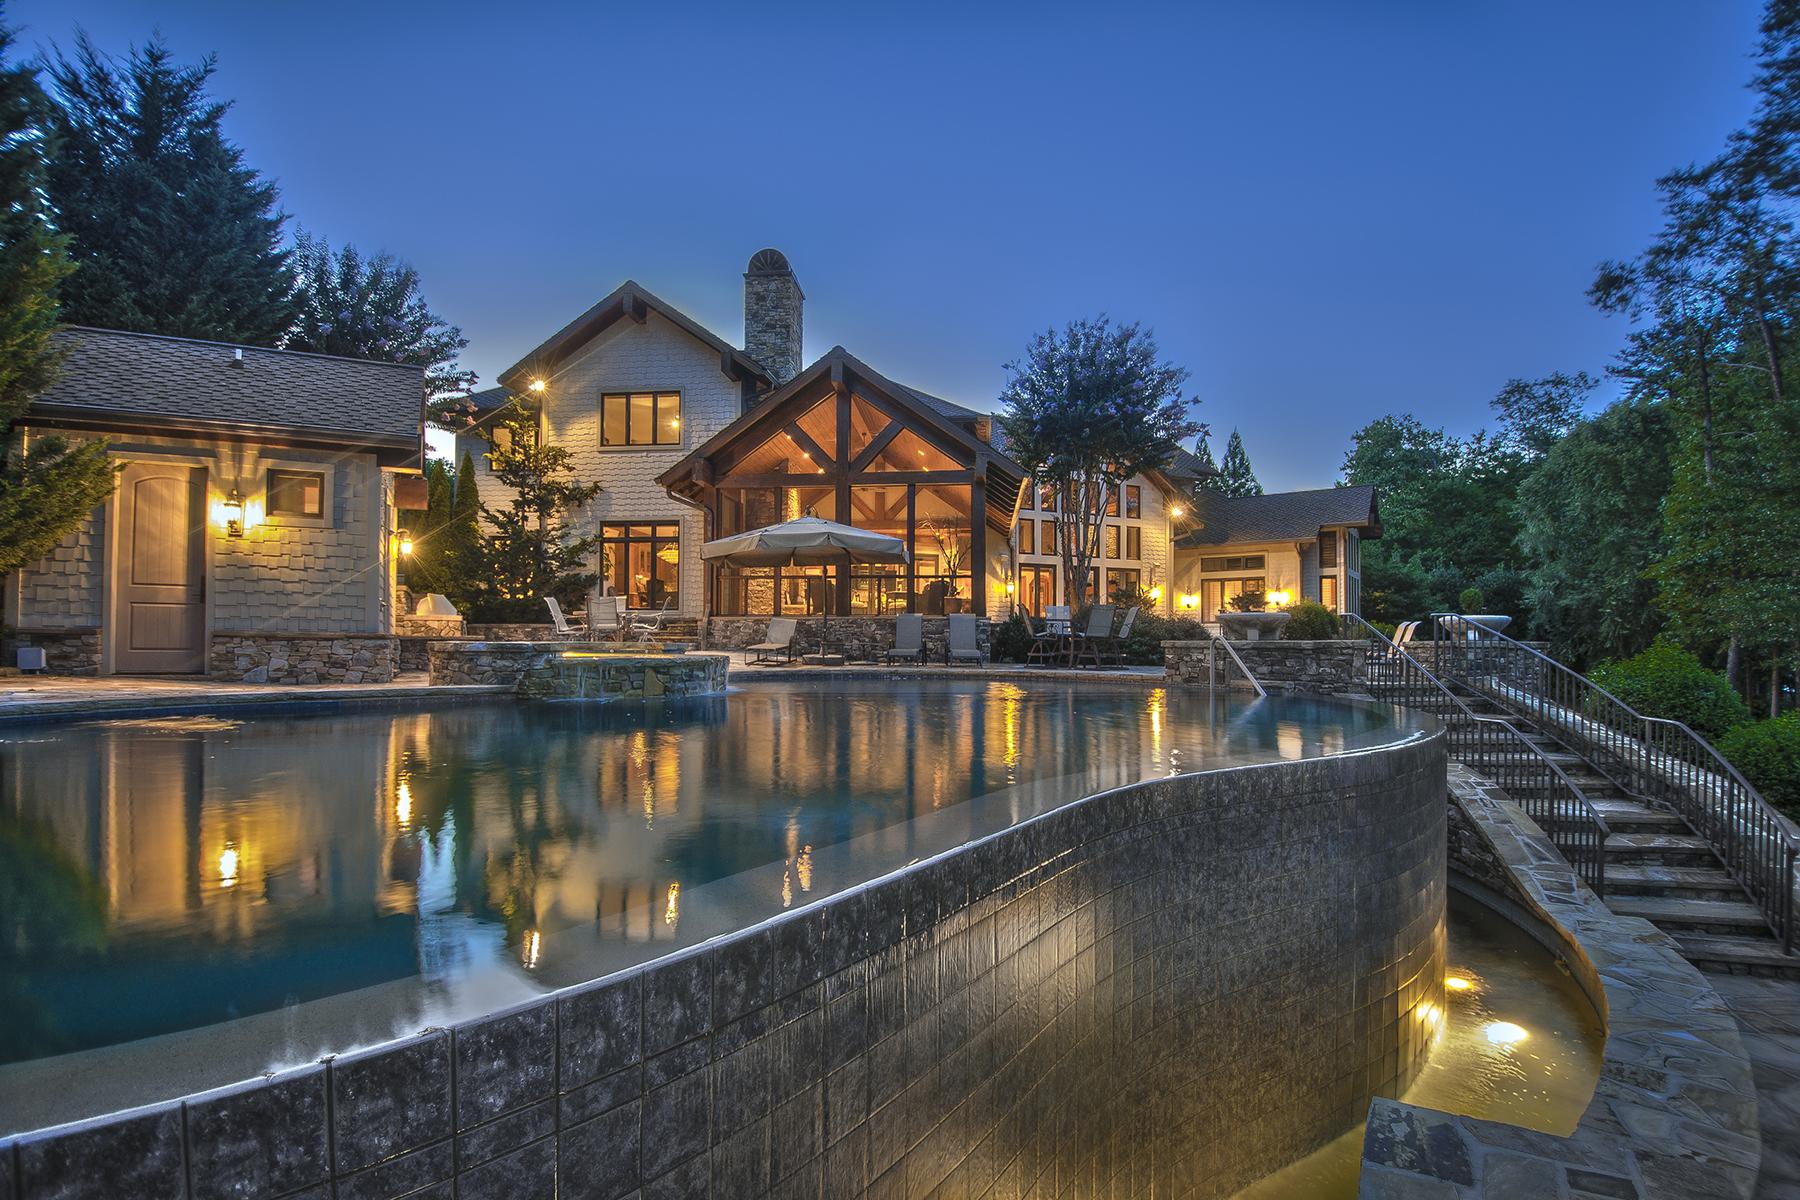 Single Family Home for Sale at UWHARRIE POINT 181 Flint Ridge Trl New London, North Carolina, 28127 United States